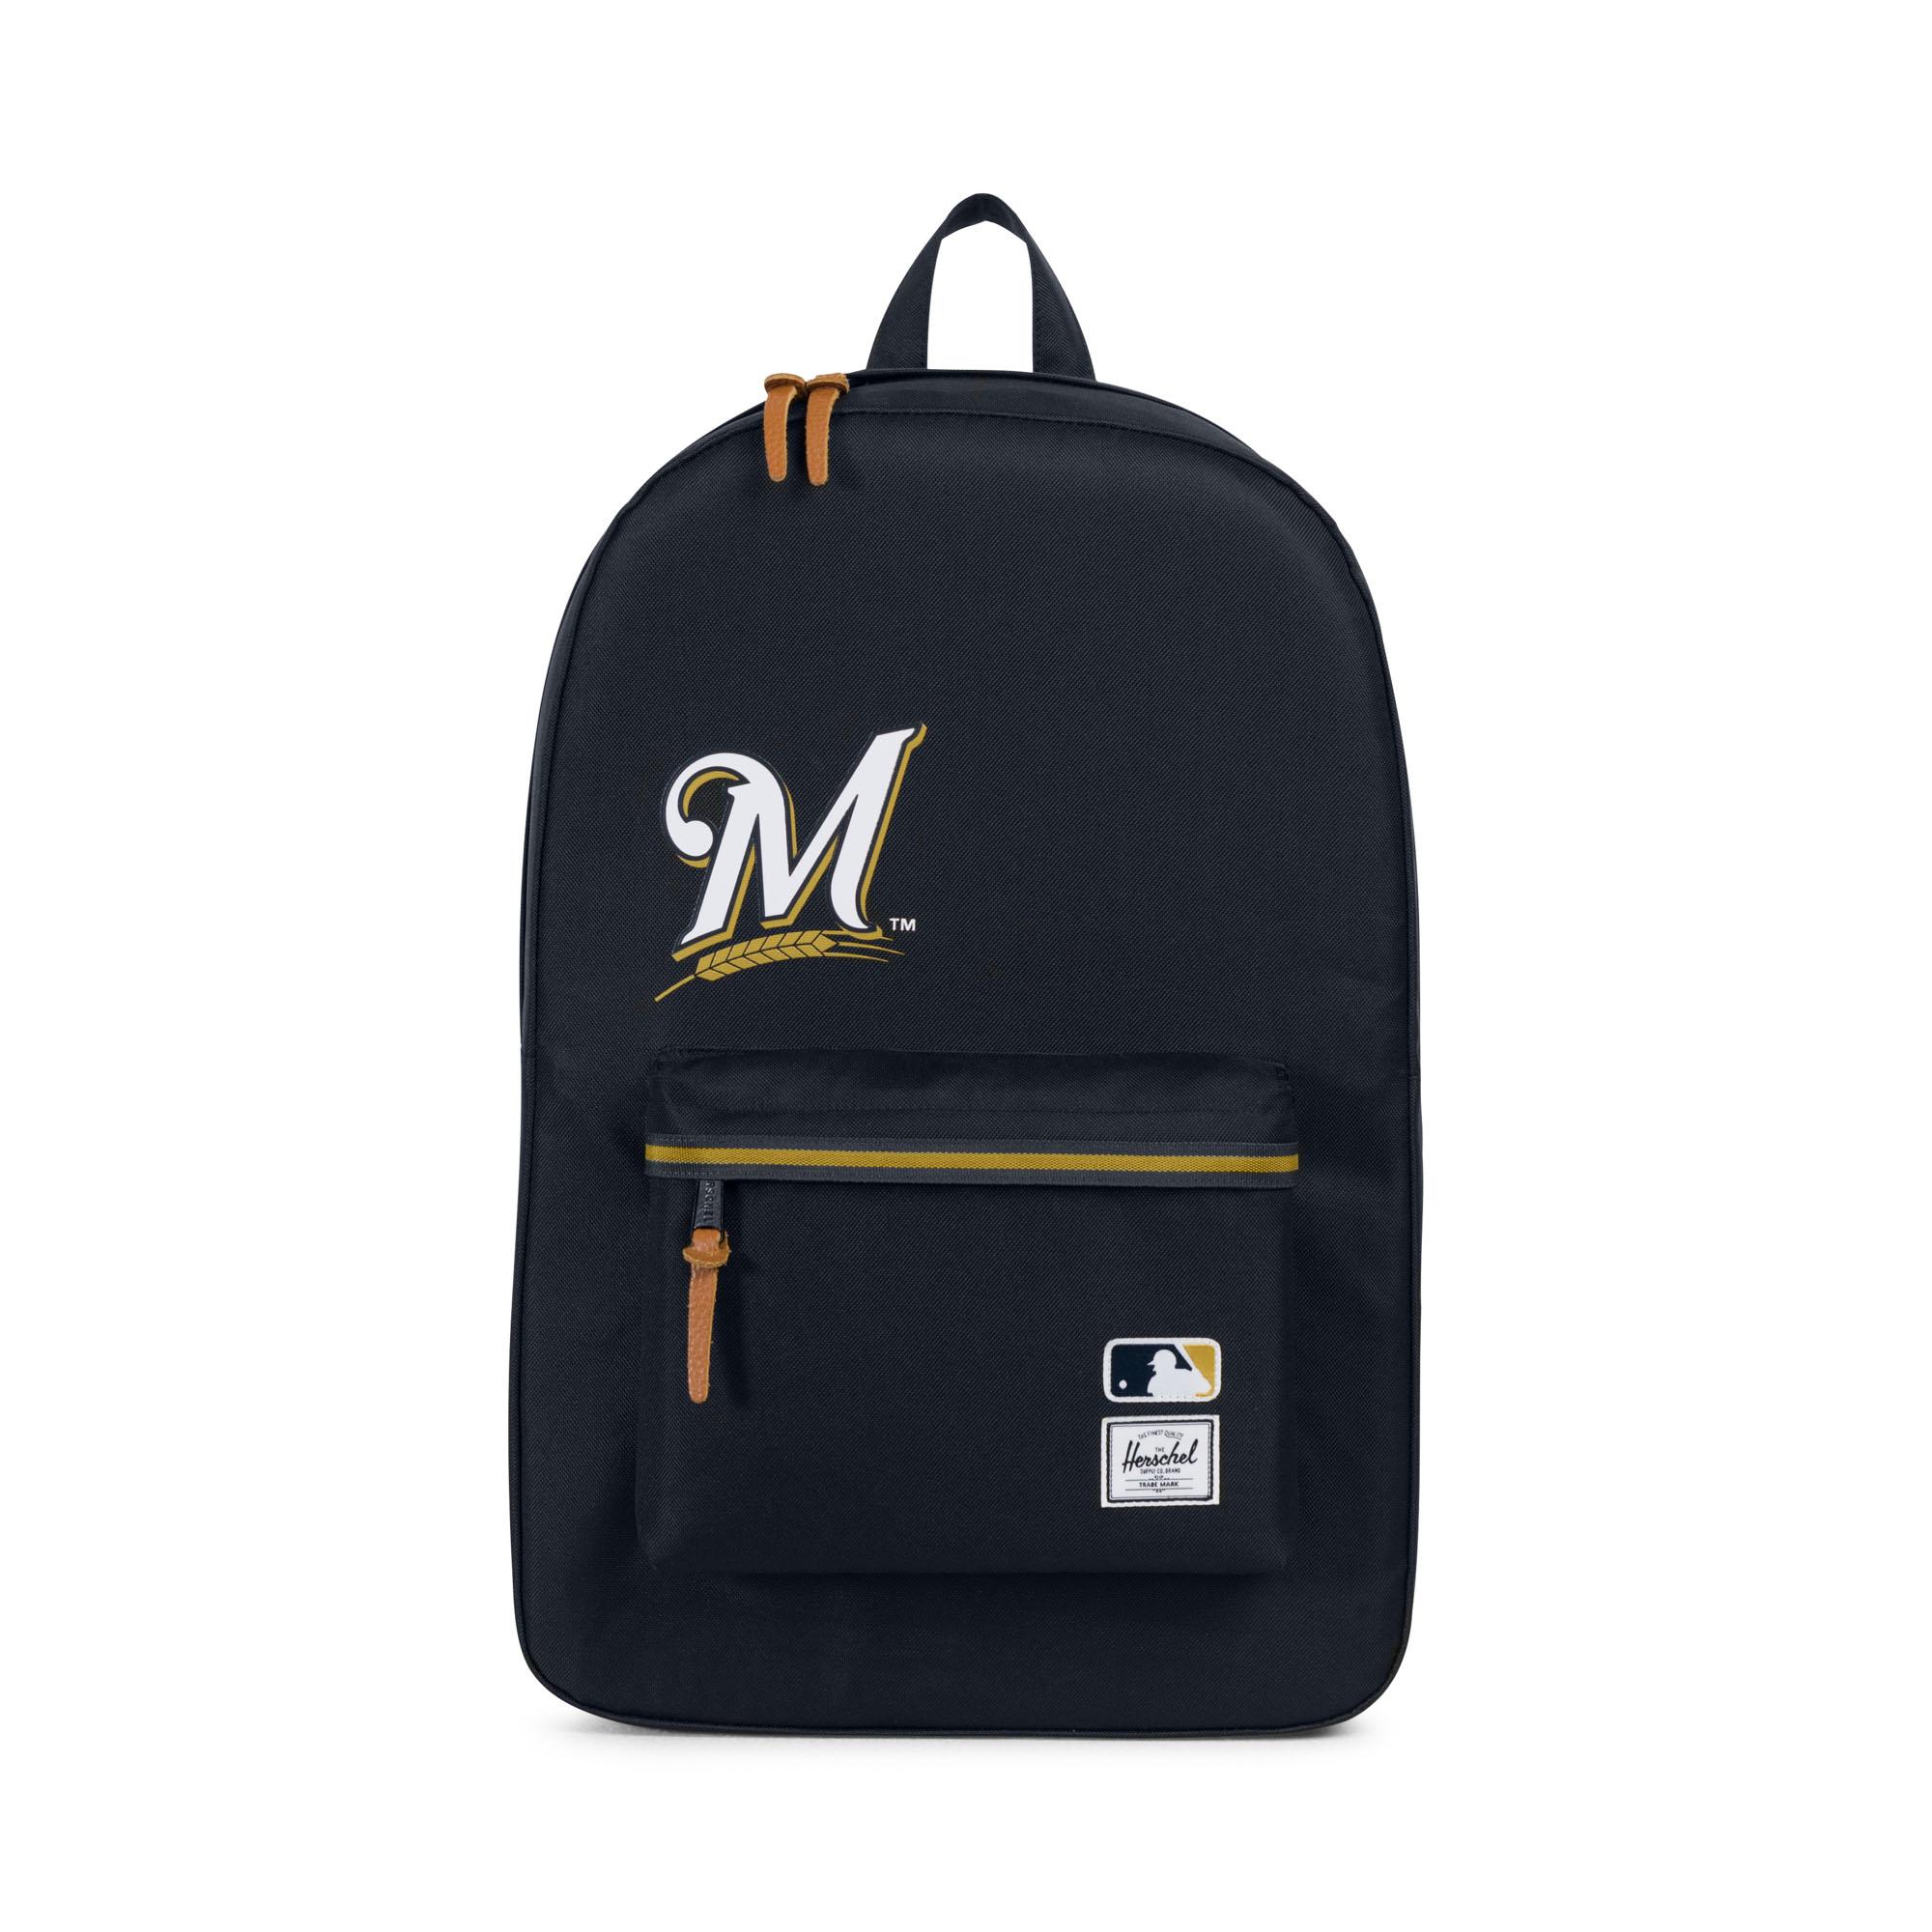 225e64c127b Heritage Backpack